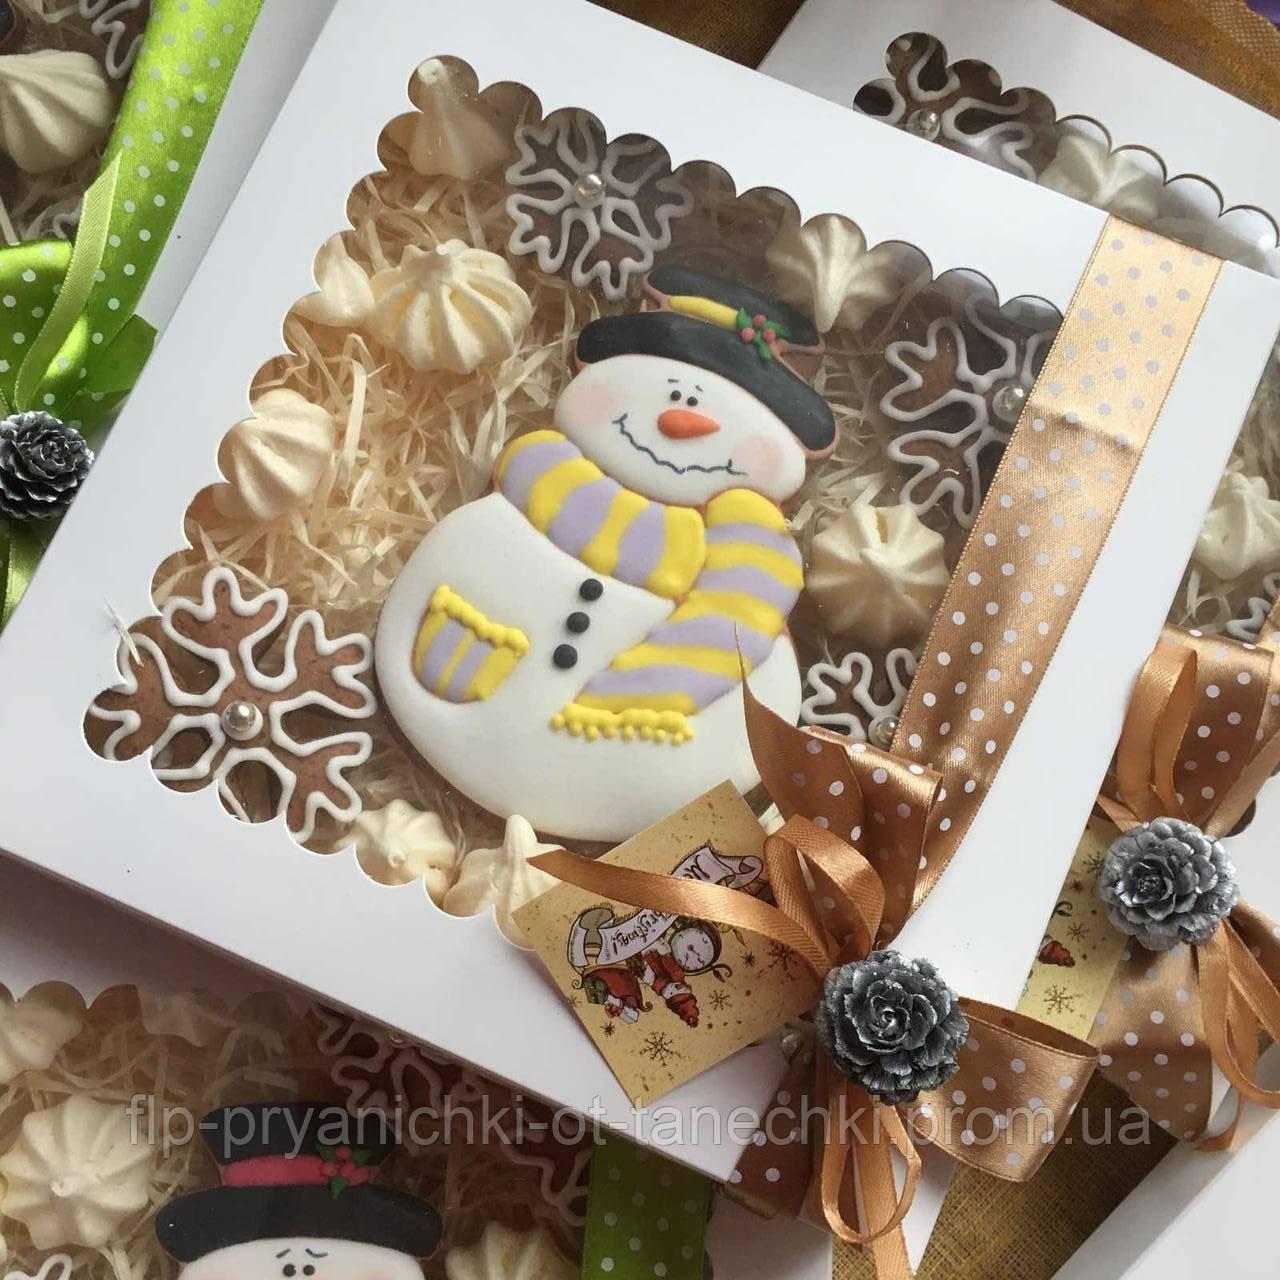 "Подарочный набор""Снеговик и снежинки"", корока 21х21 см"